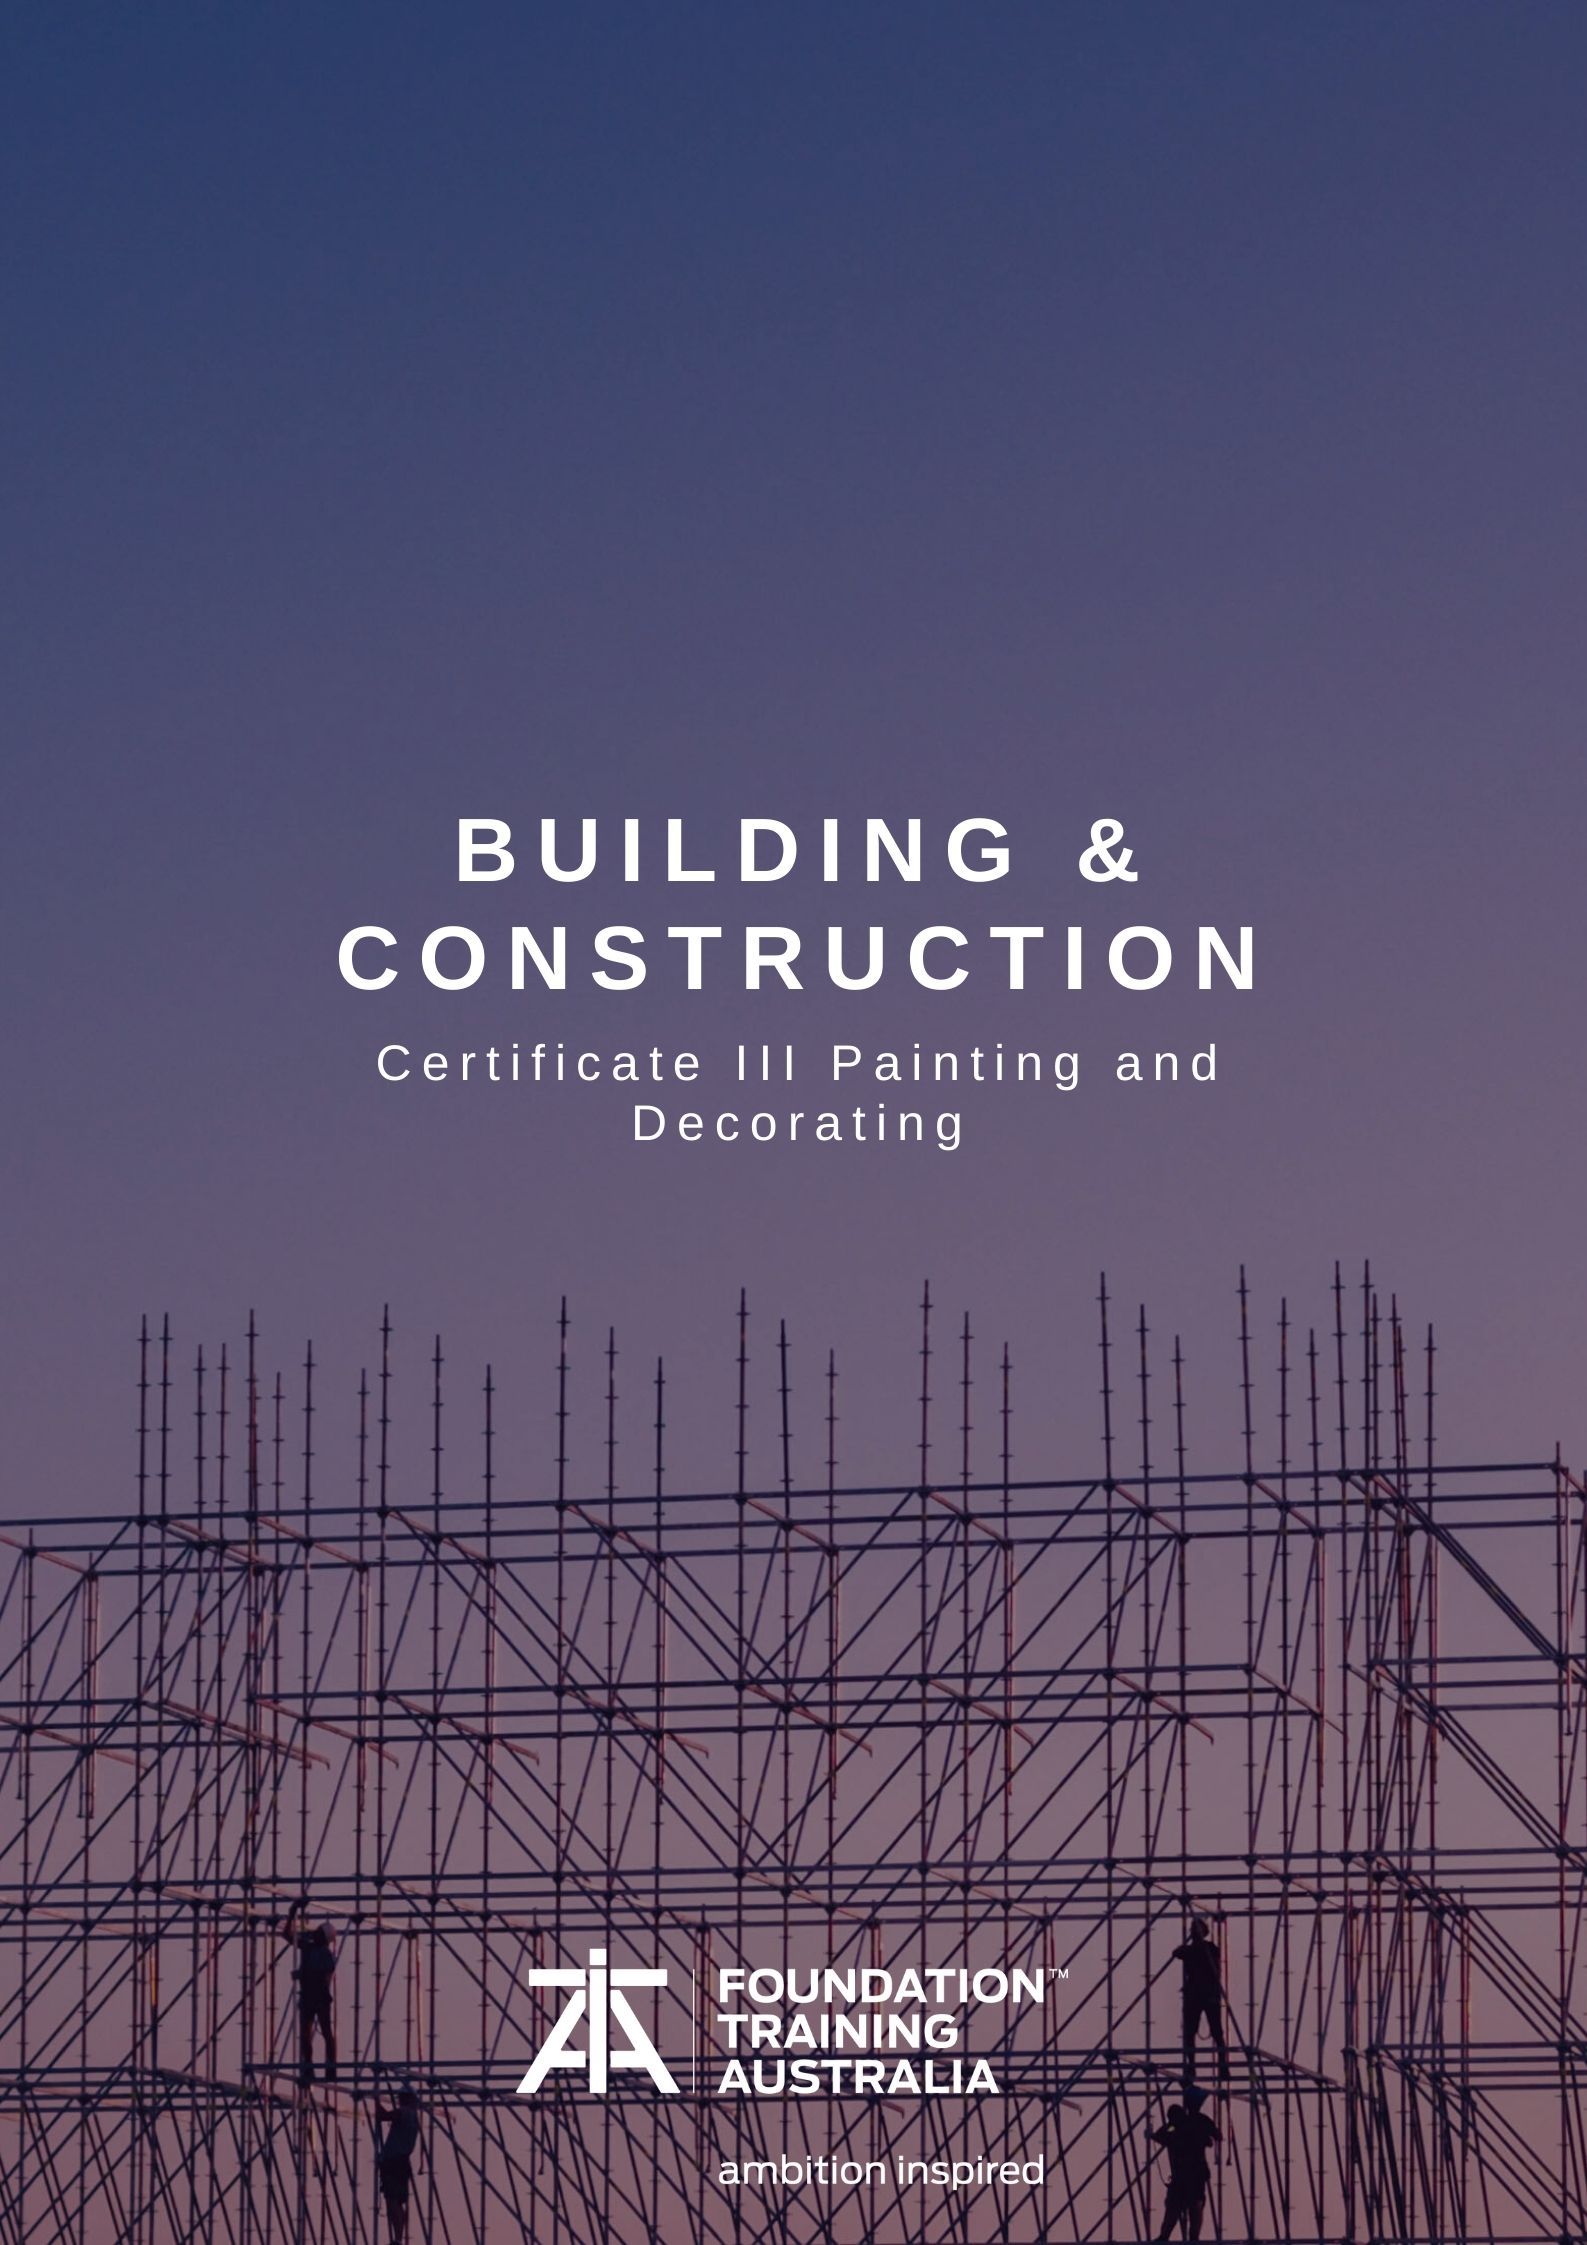 https://www.fta.edu.au/wp-content/uploads/2020/06/Building-Flyer-Covers-3.jpg